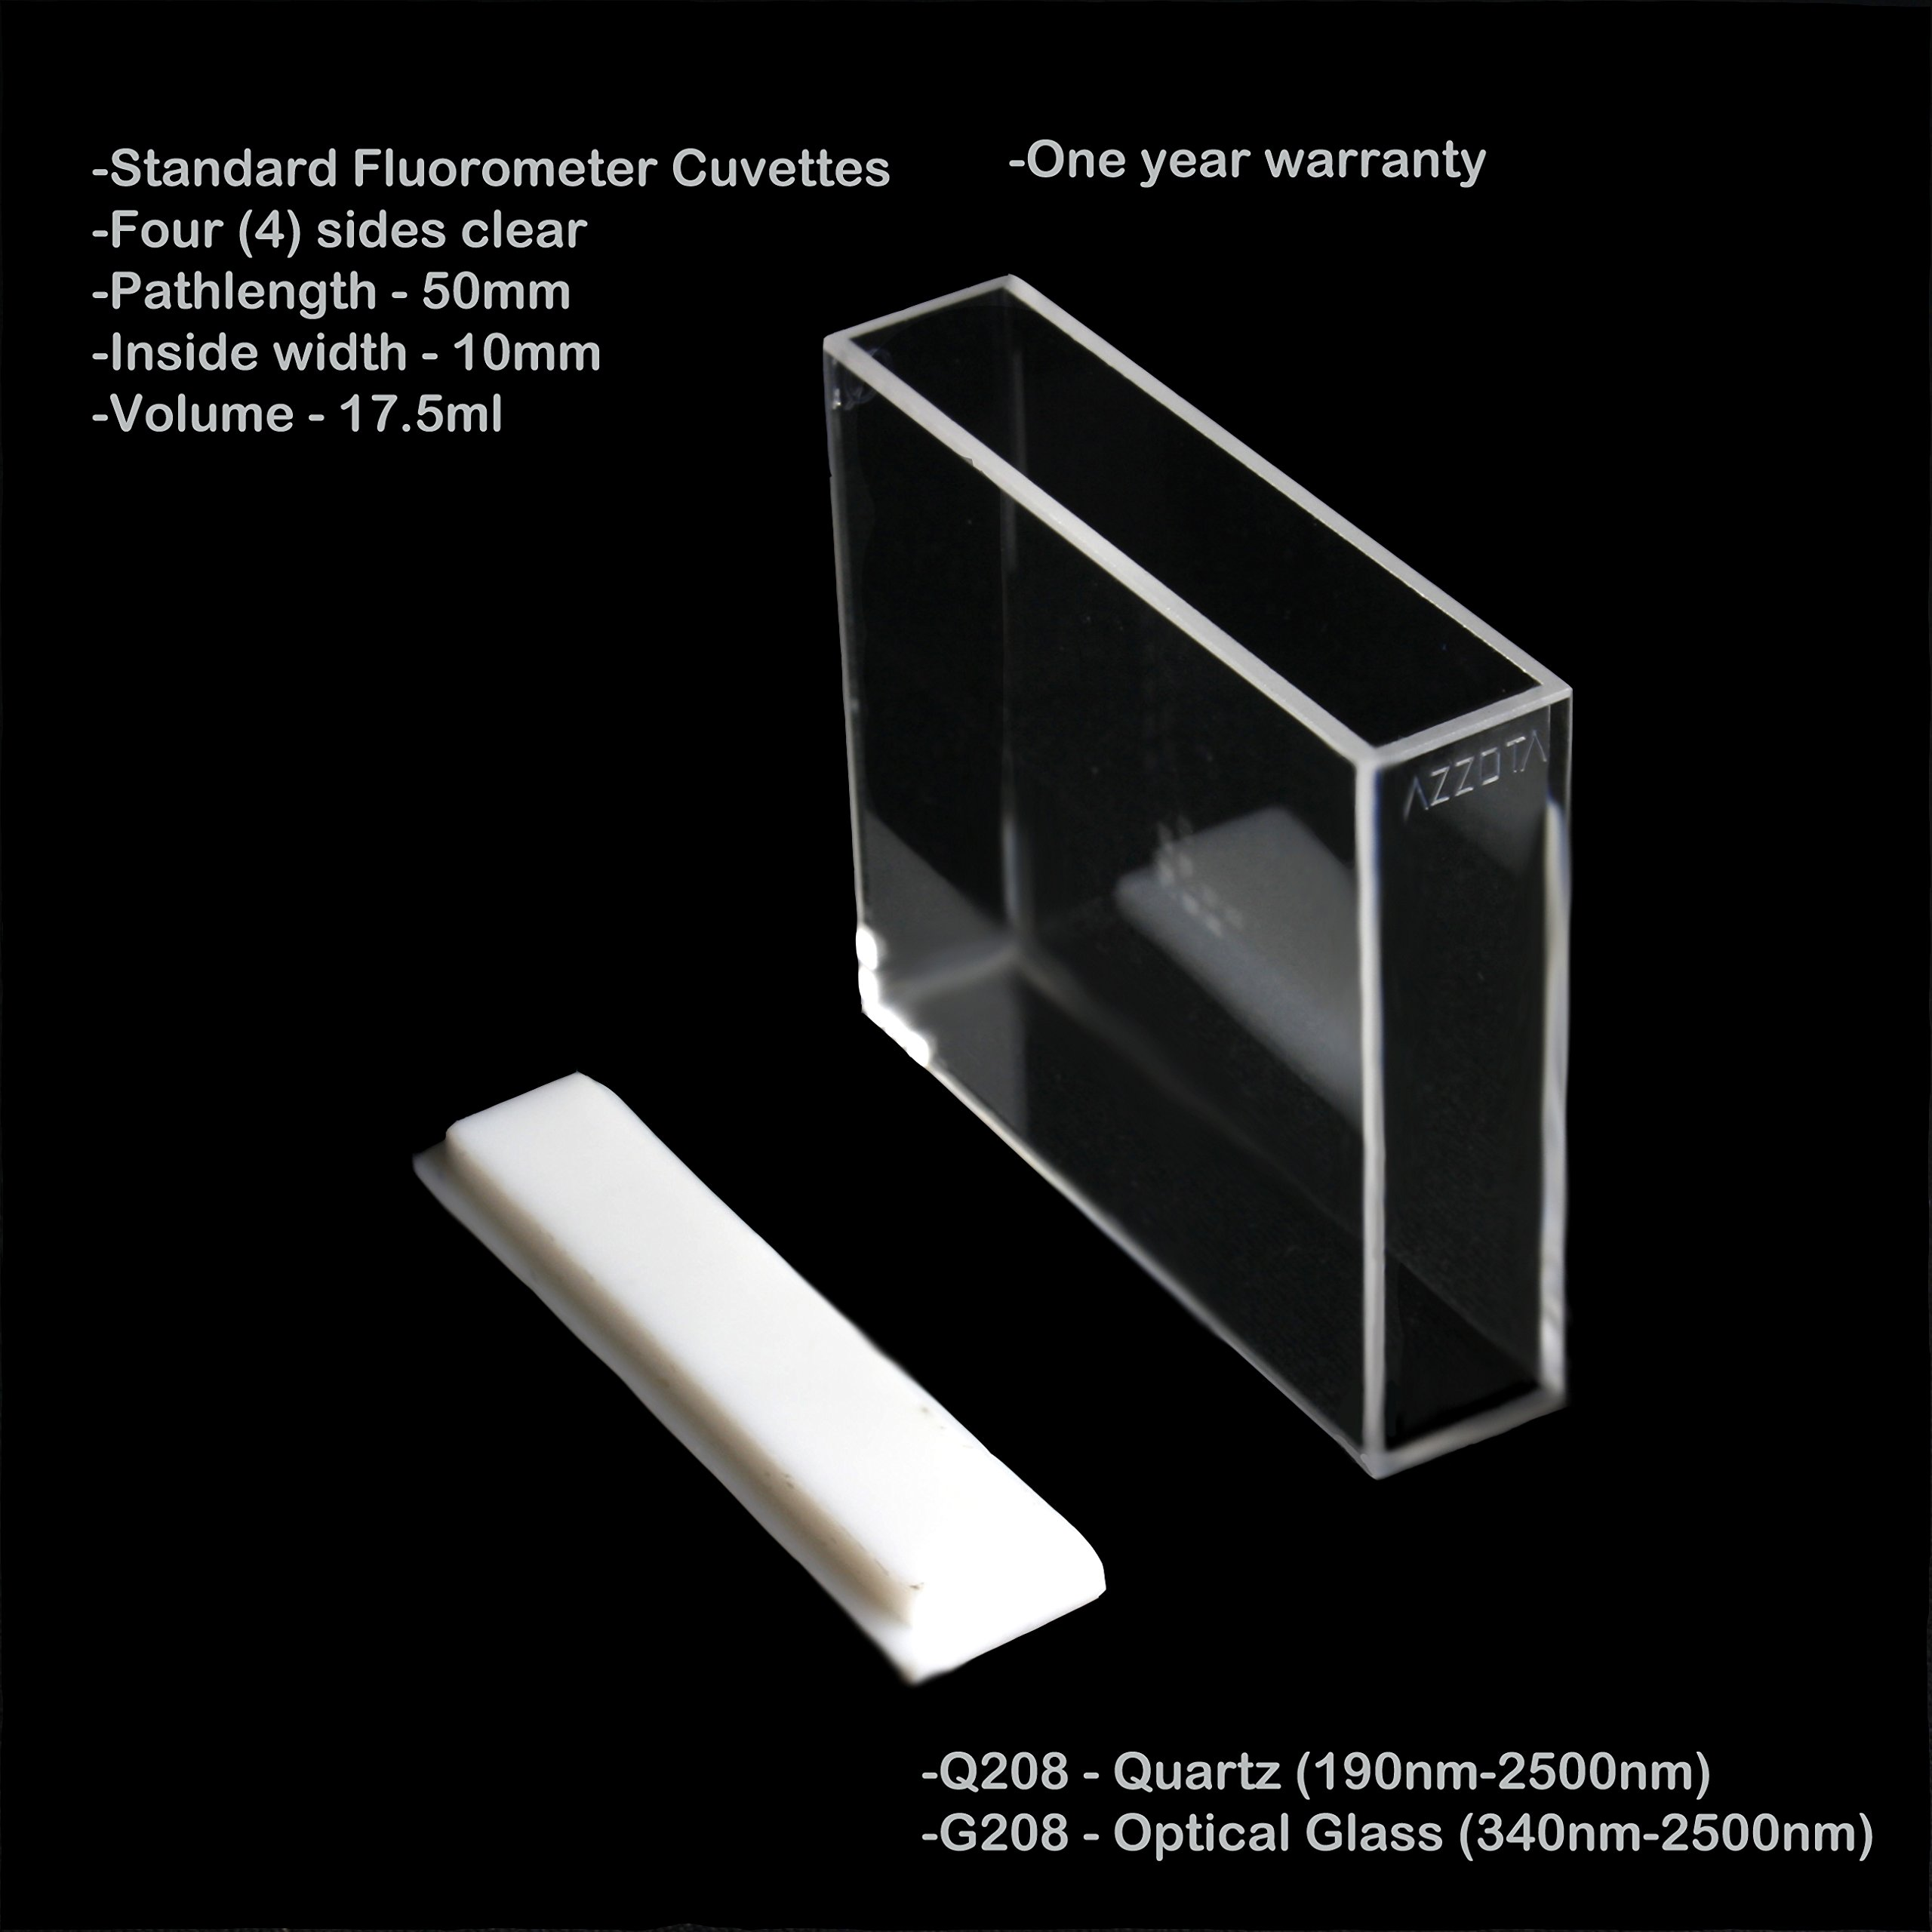 50mm Pathlength Quartz Fluorometer Cuvettes - 17.5ml